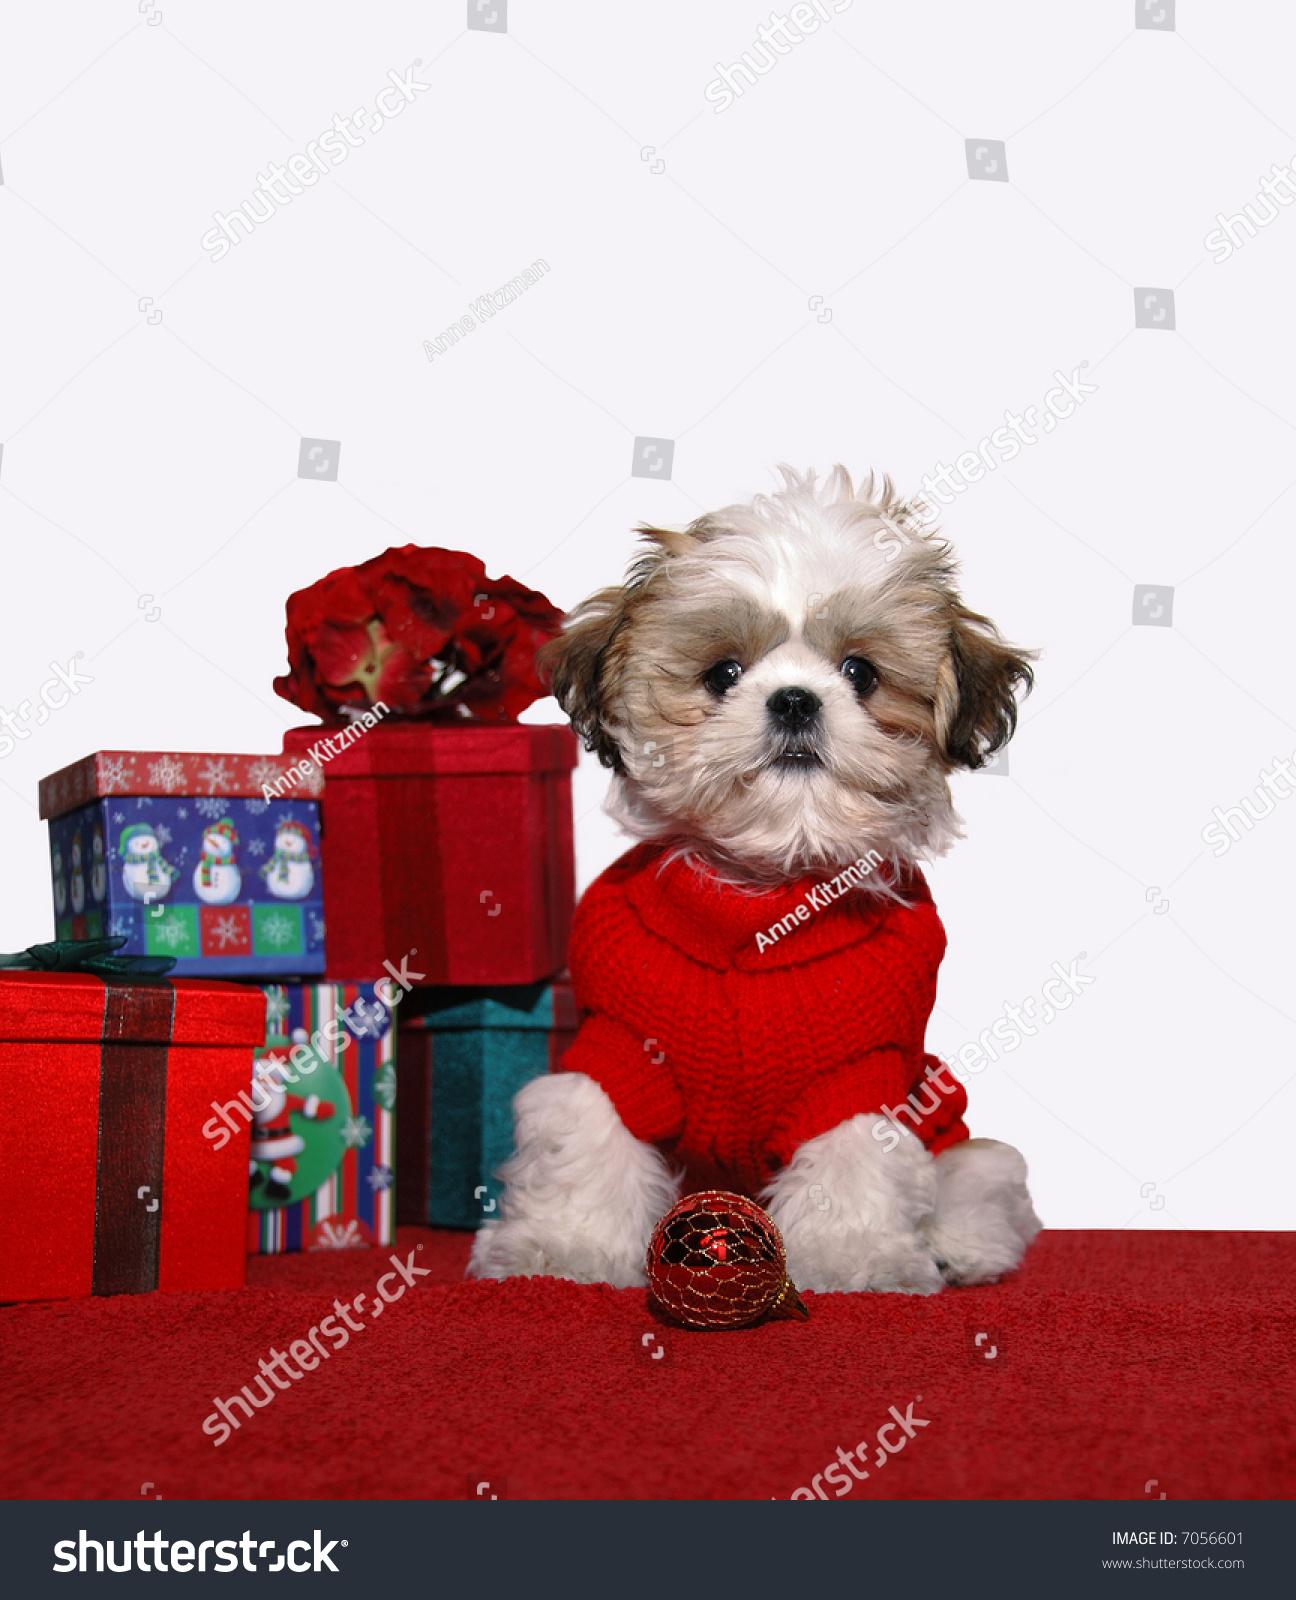 Puppy Red Sweater Shih Tzu Puppy Stock Photo Edit Now 7056601